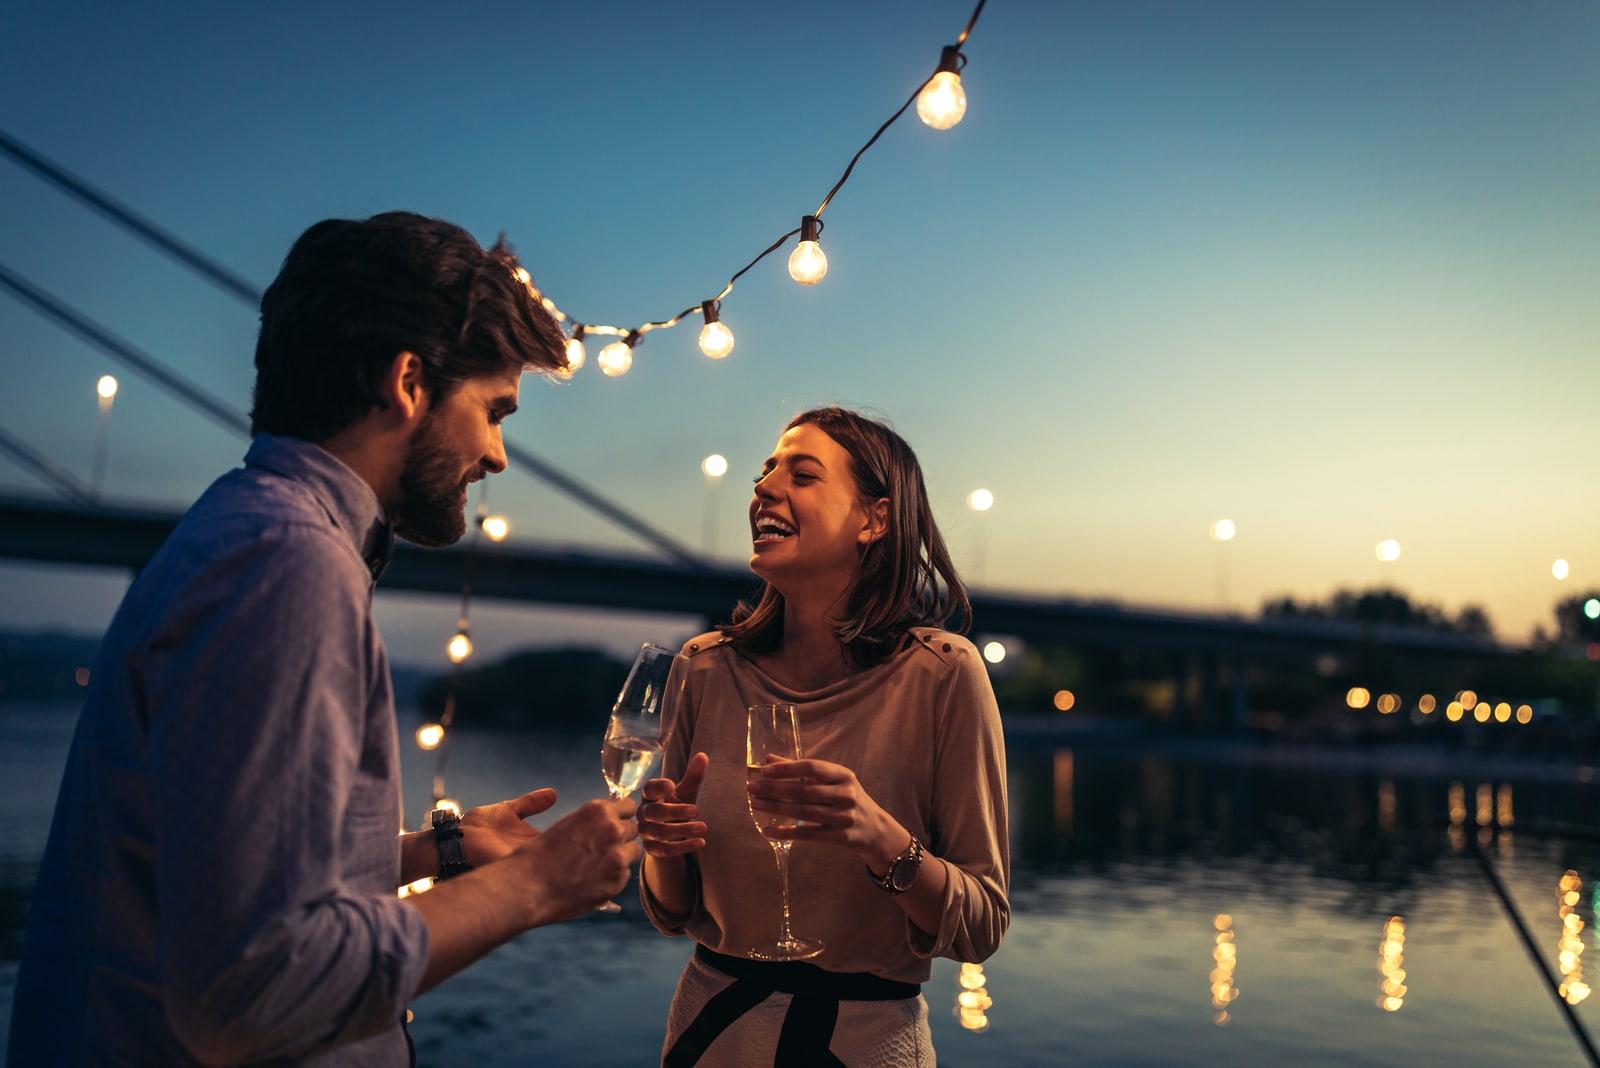 smiling man and woman talking